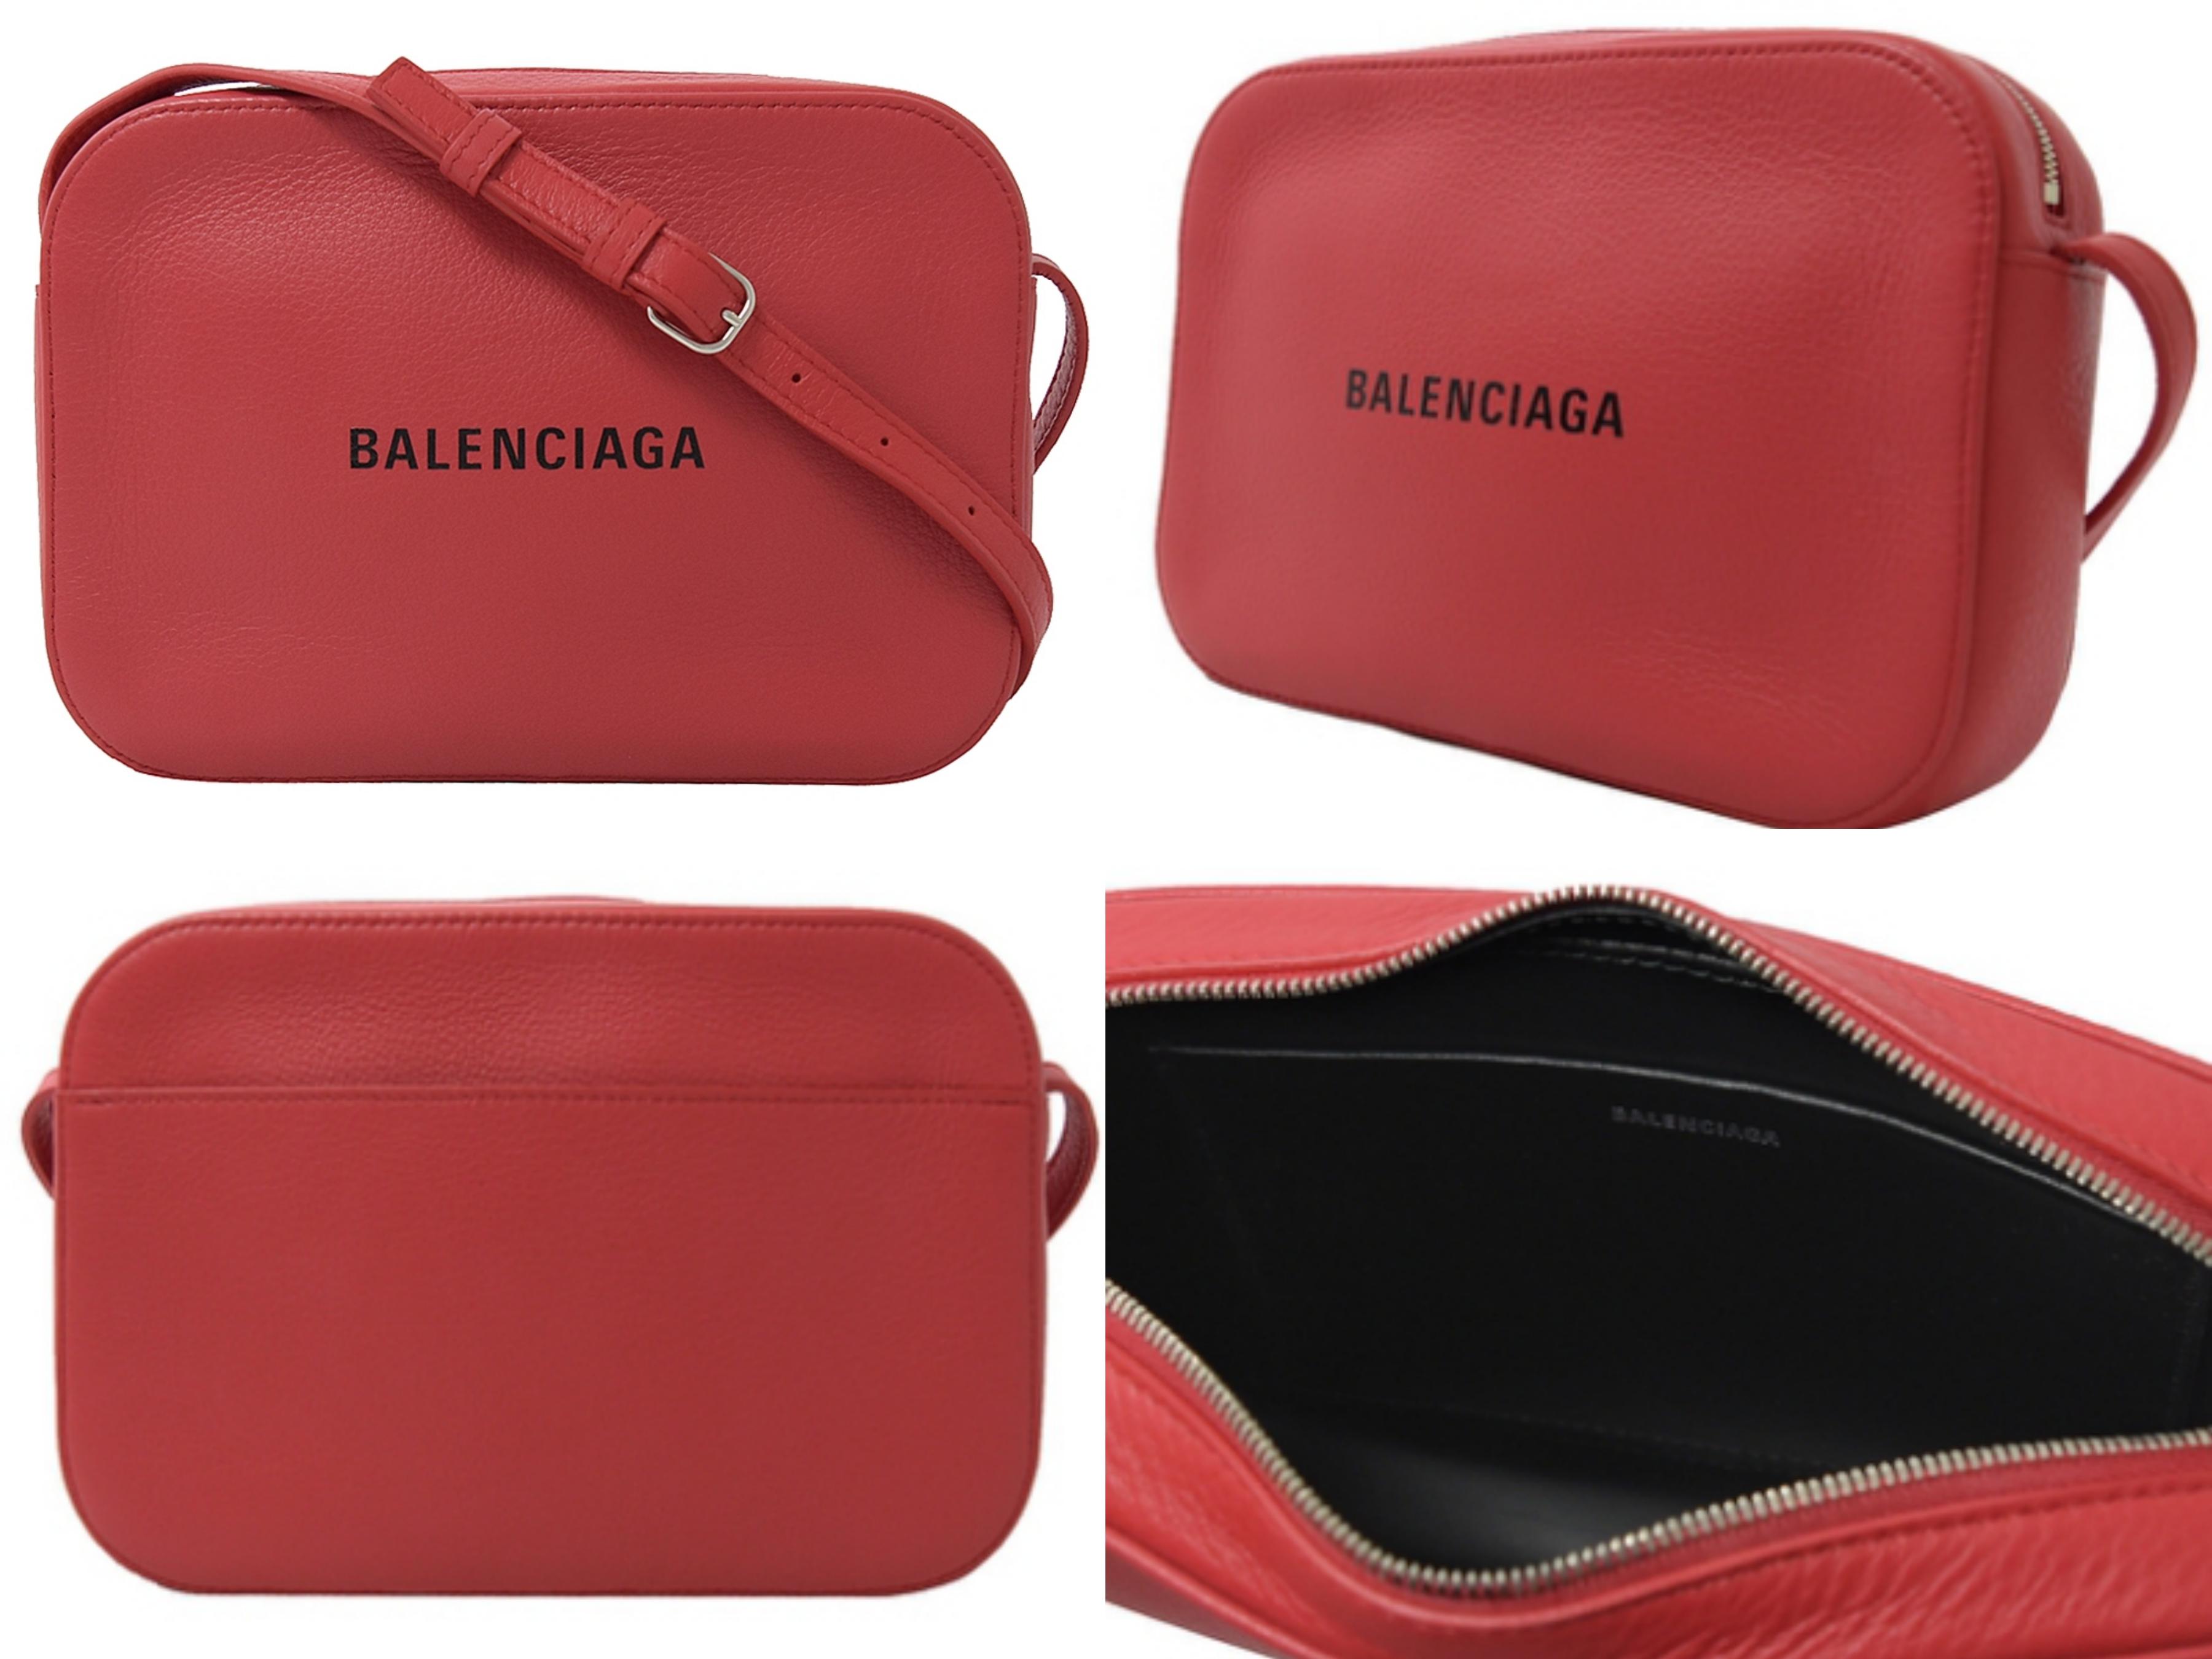 BALENCIAGA 燙印英字LOGO牛皮斜背小方包(紅) 超夯小斜背包款,造型可愛迷你,外型簡約好搭配